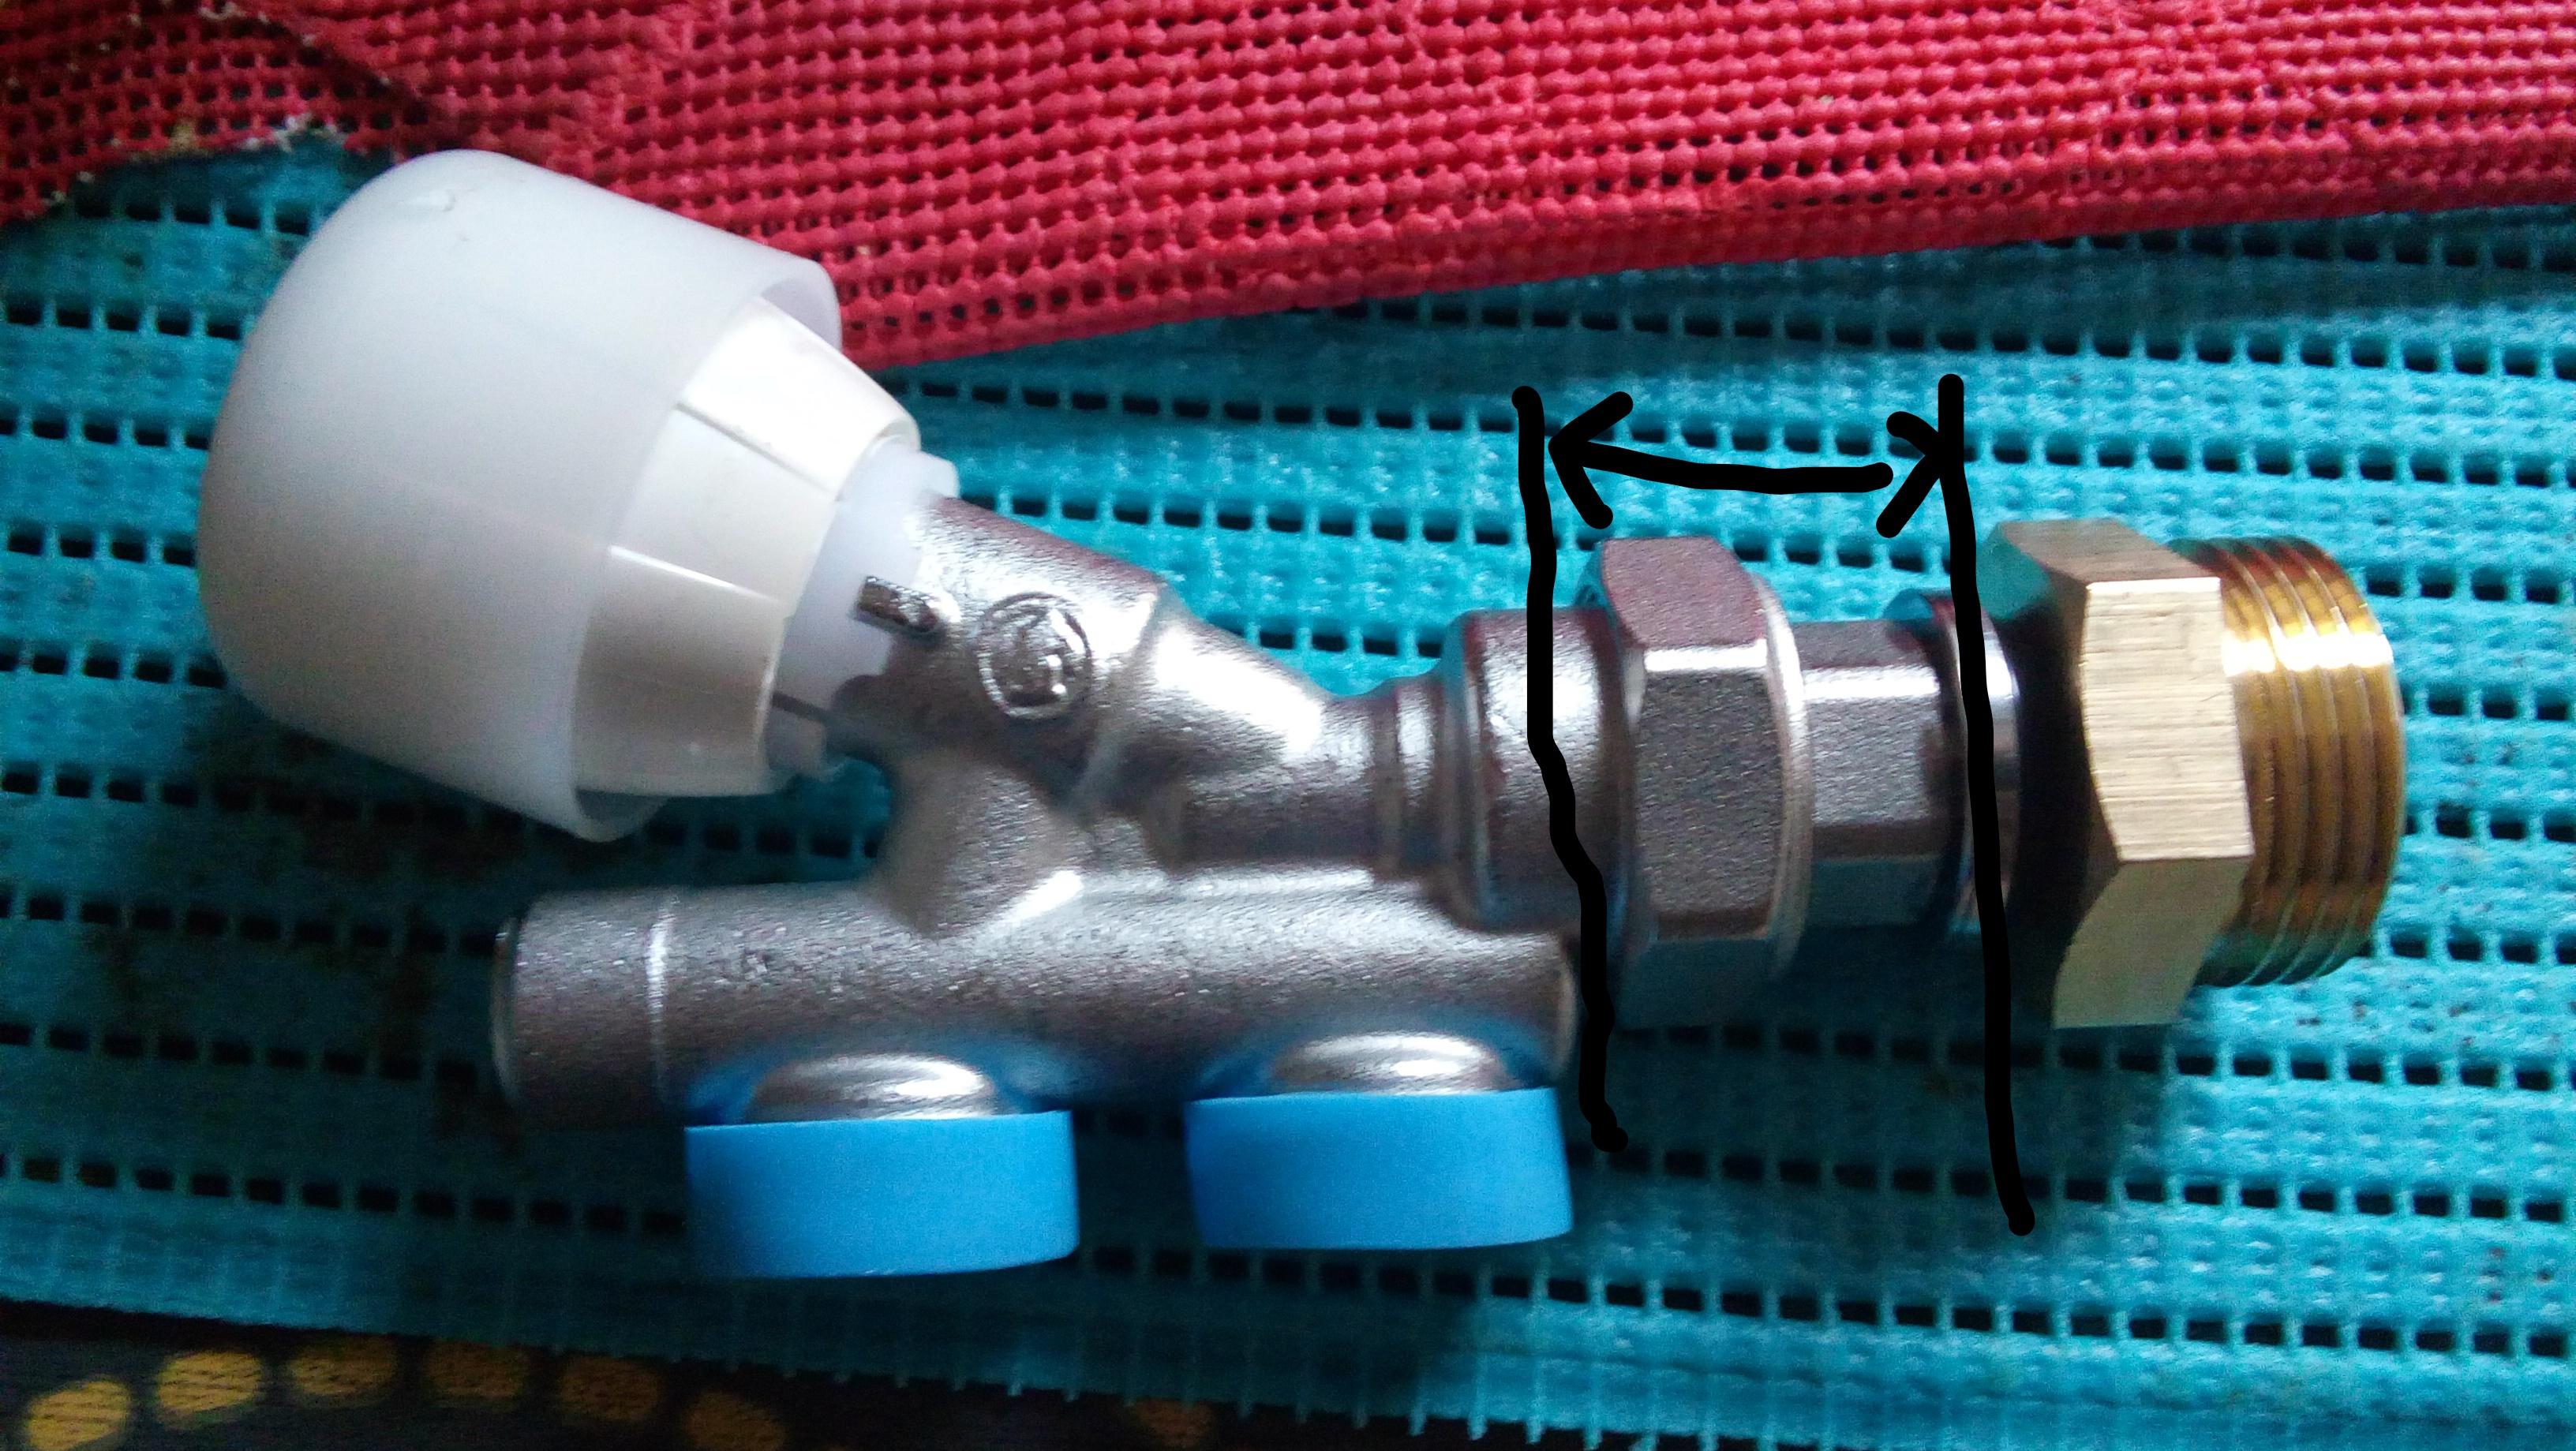 Inkedmontage actuelle robinet R437 NX031 + raccord femelle 15-21 - mâle 26-34_LI paint.jpg, 3.91 mb, 3264 x 1839